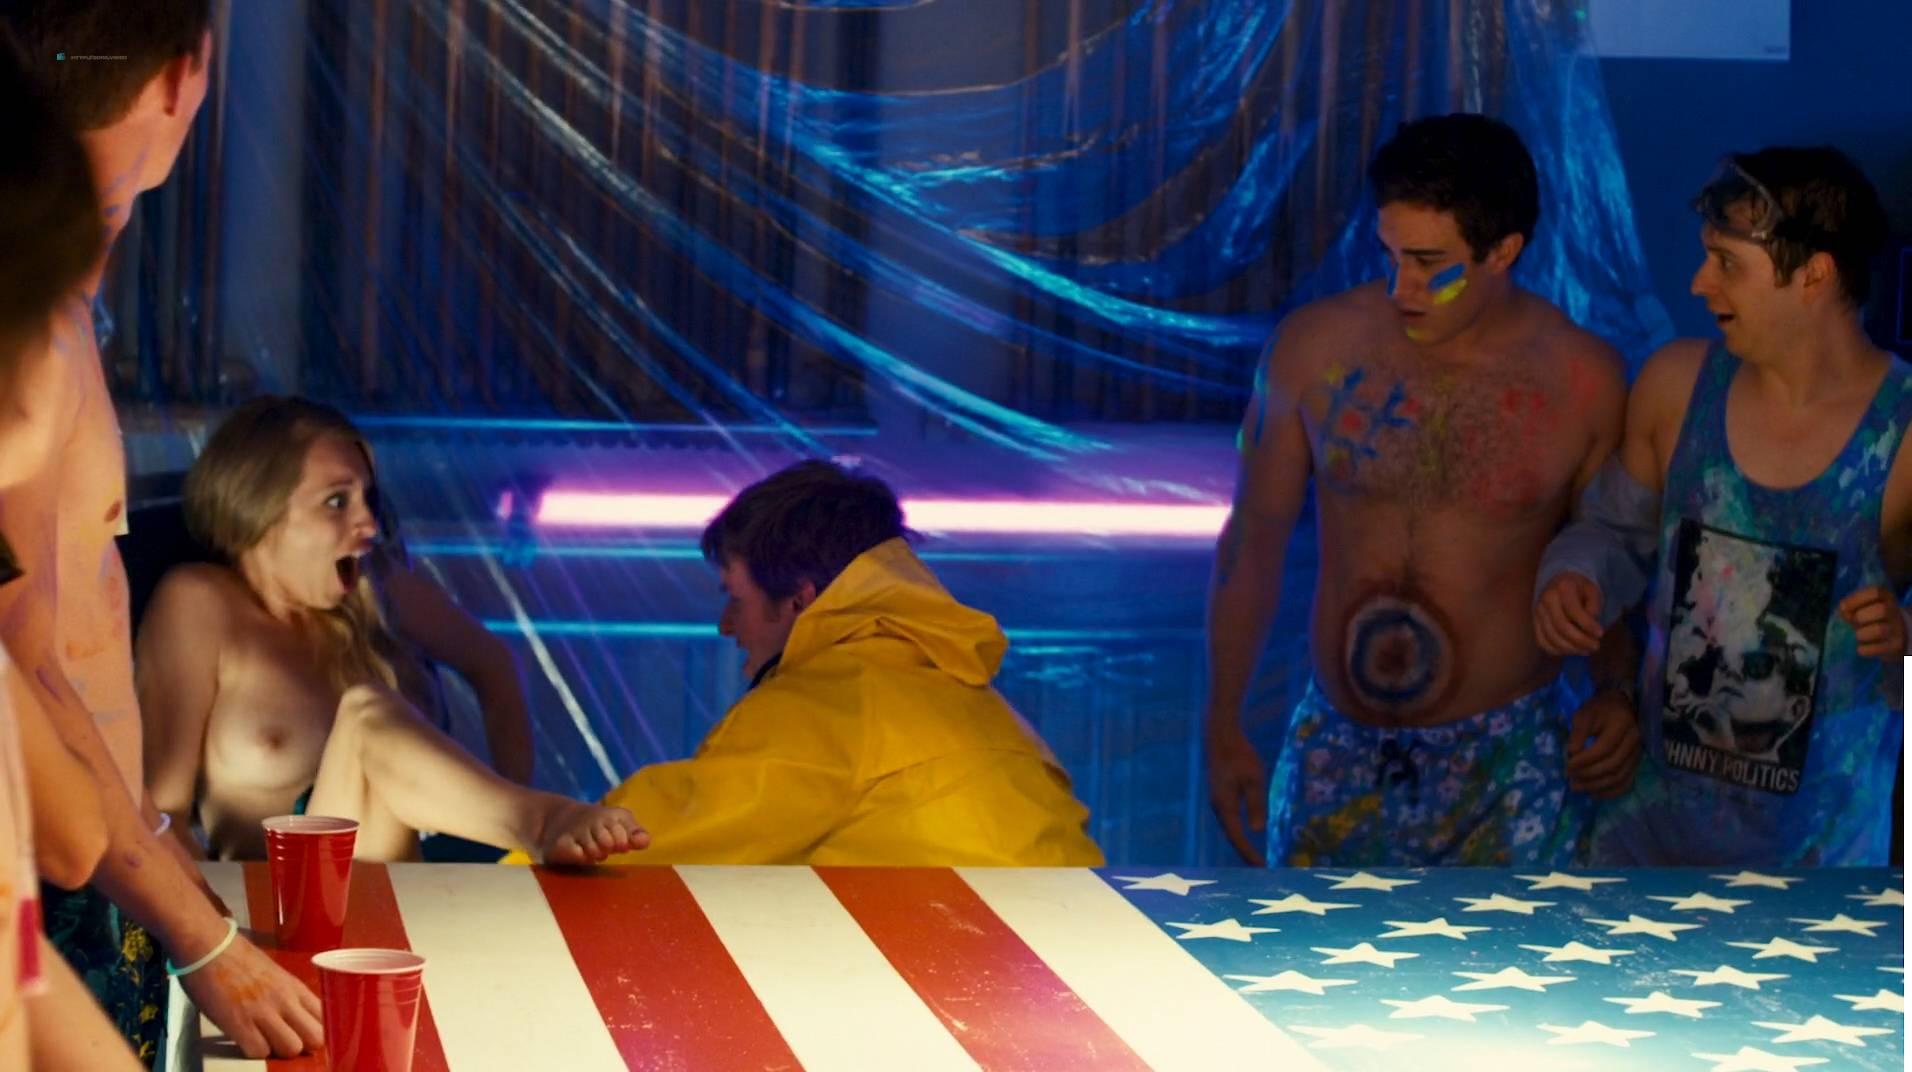 Jennifer Krukowski nude topless Aubrey Ferron and others all nude - Total Frat Movie (2016.) HD 1080p WEB (4)